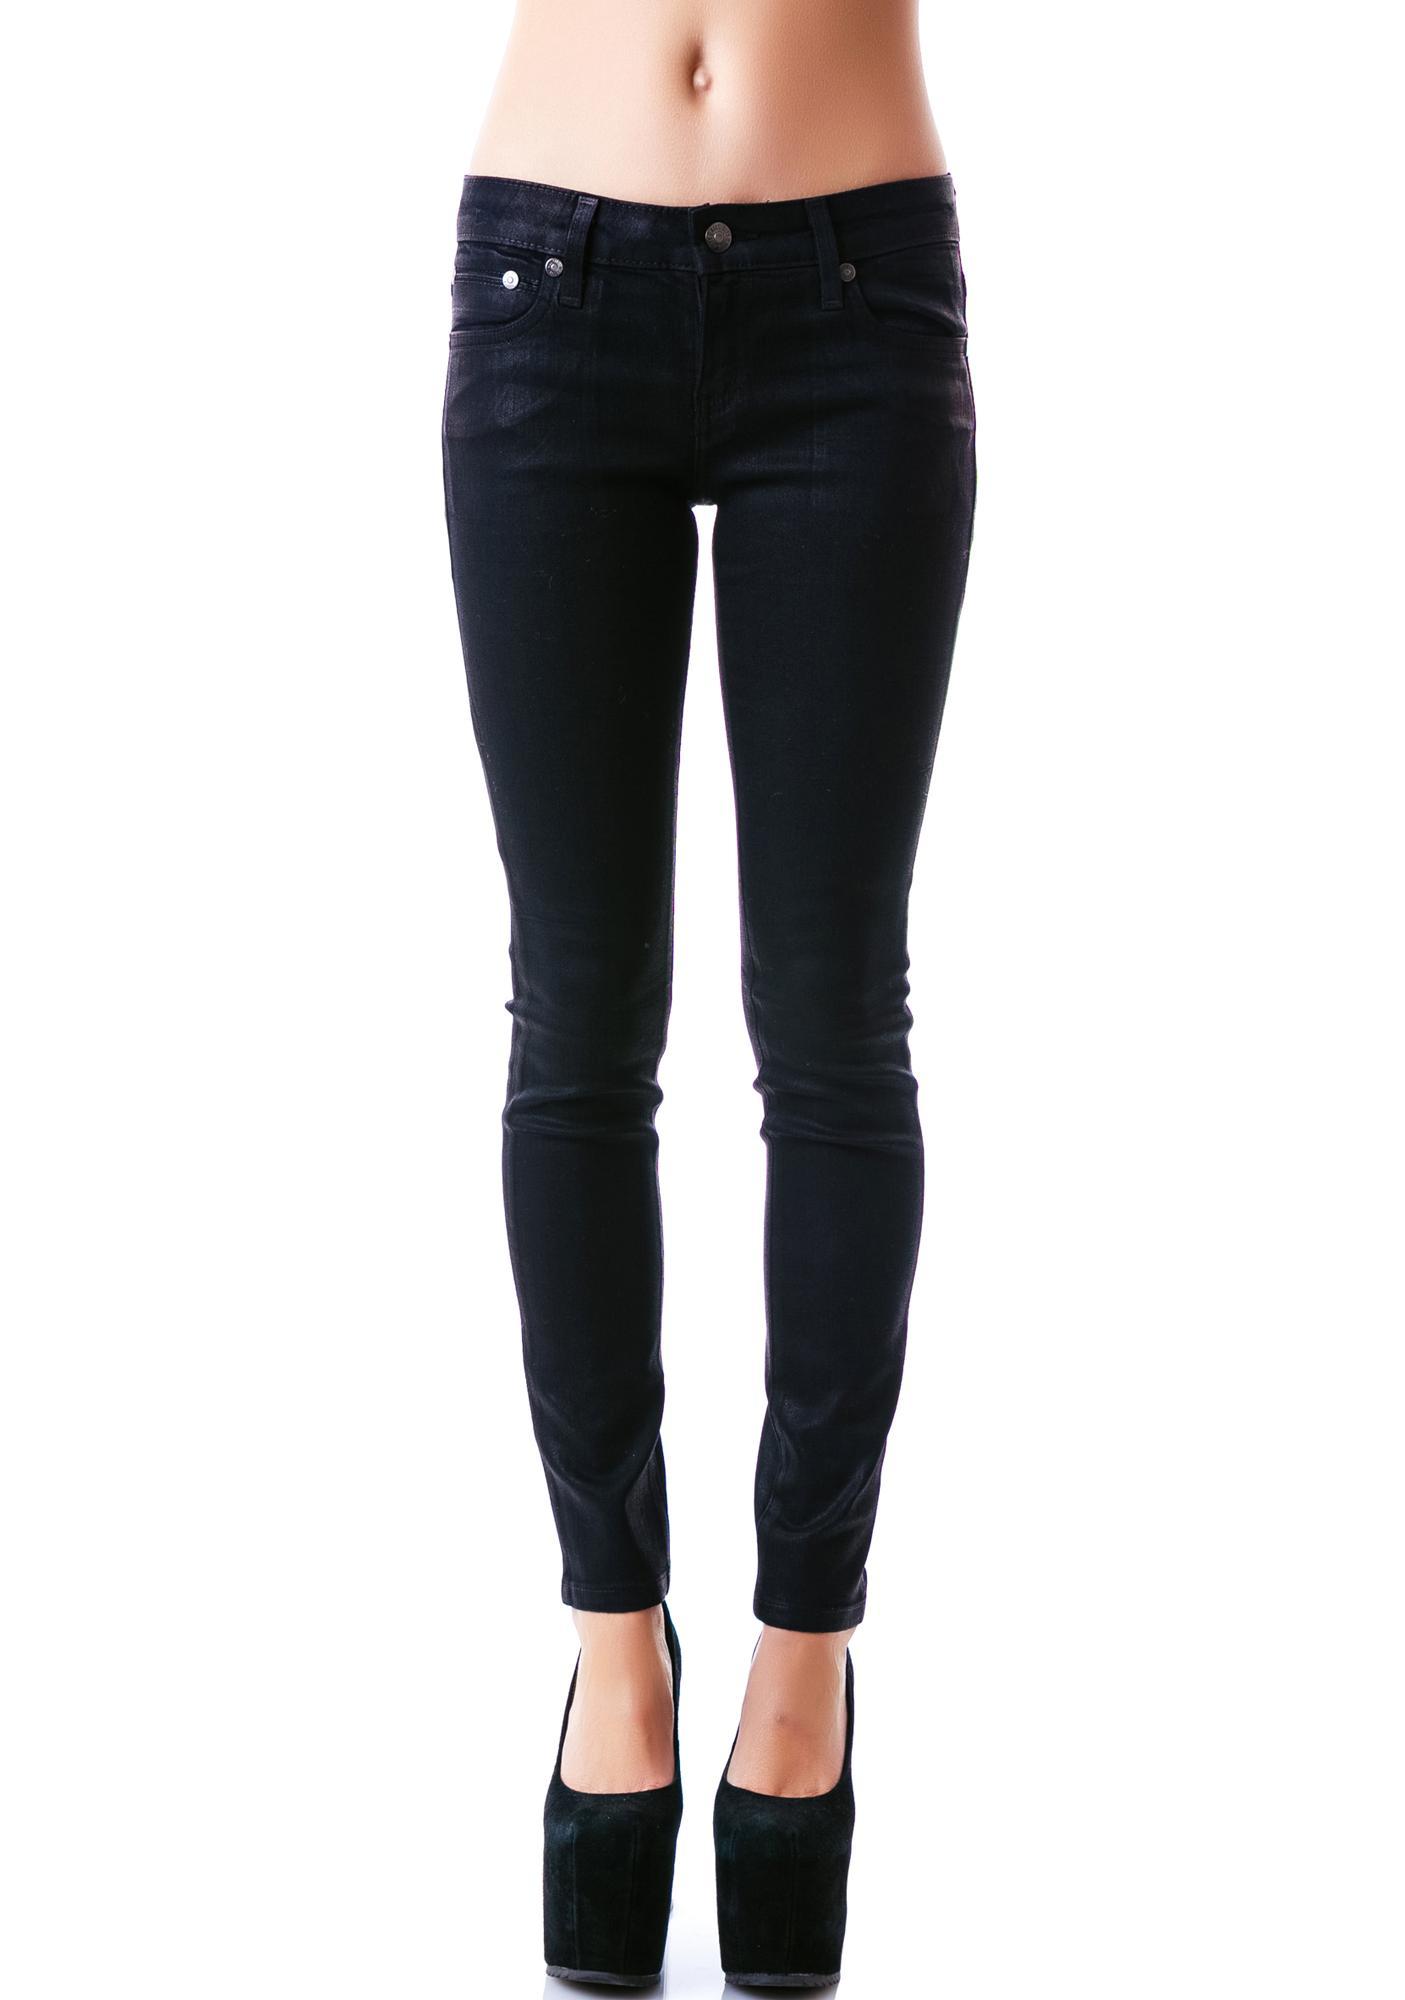 Kill City Wax Coated Stretch Junkie Jeans